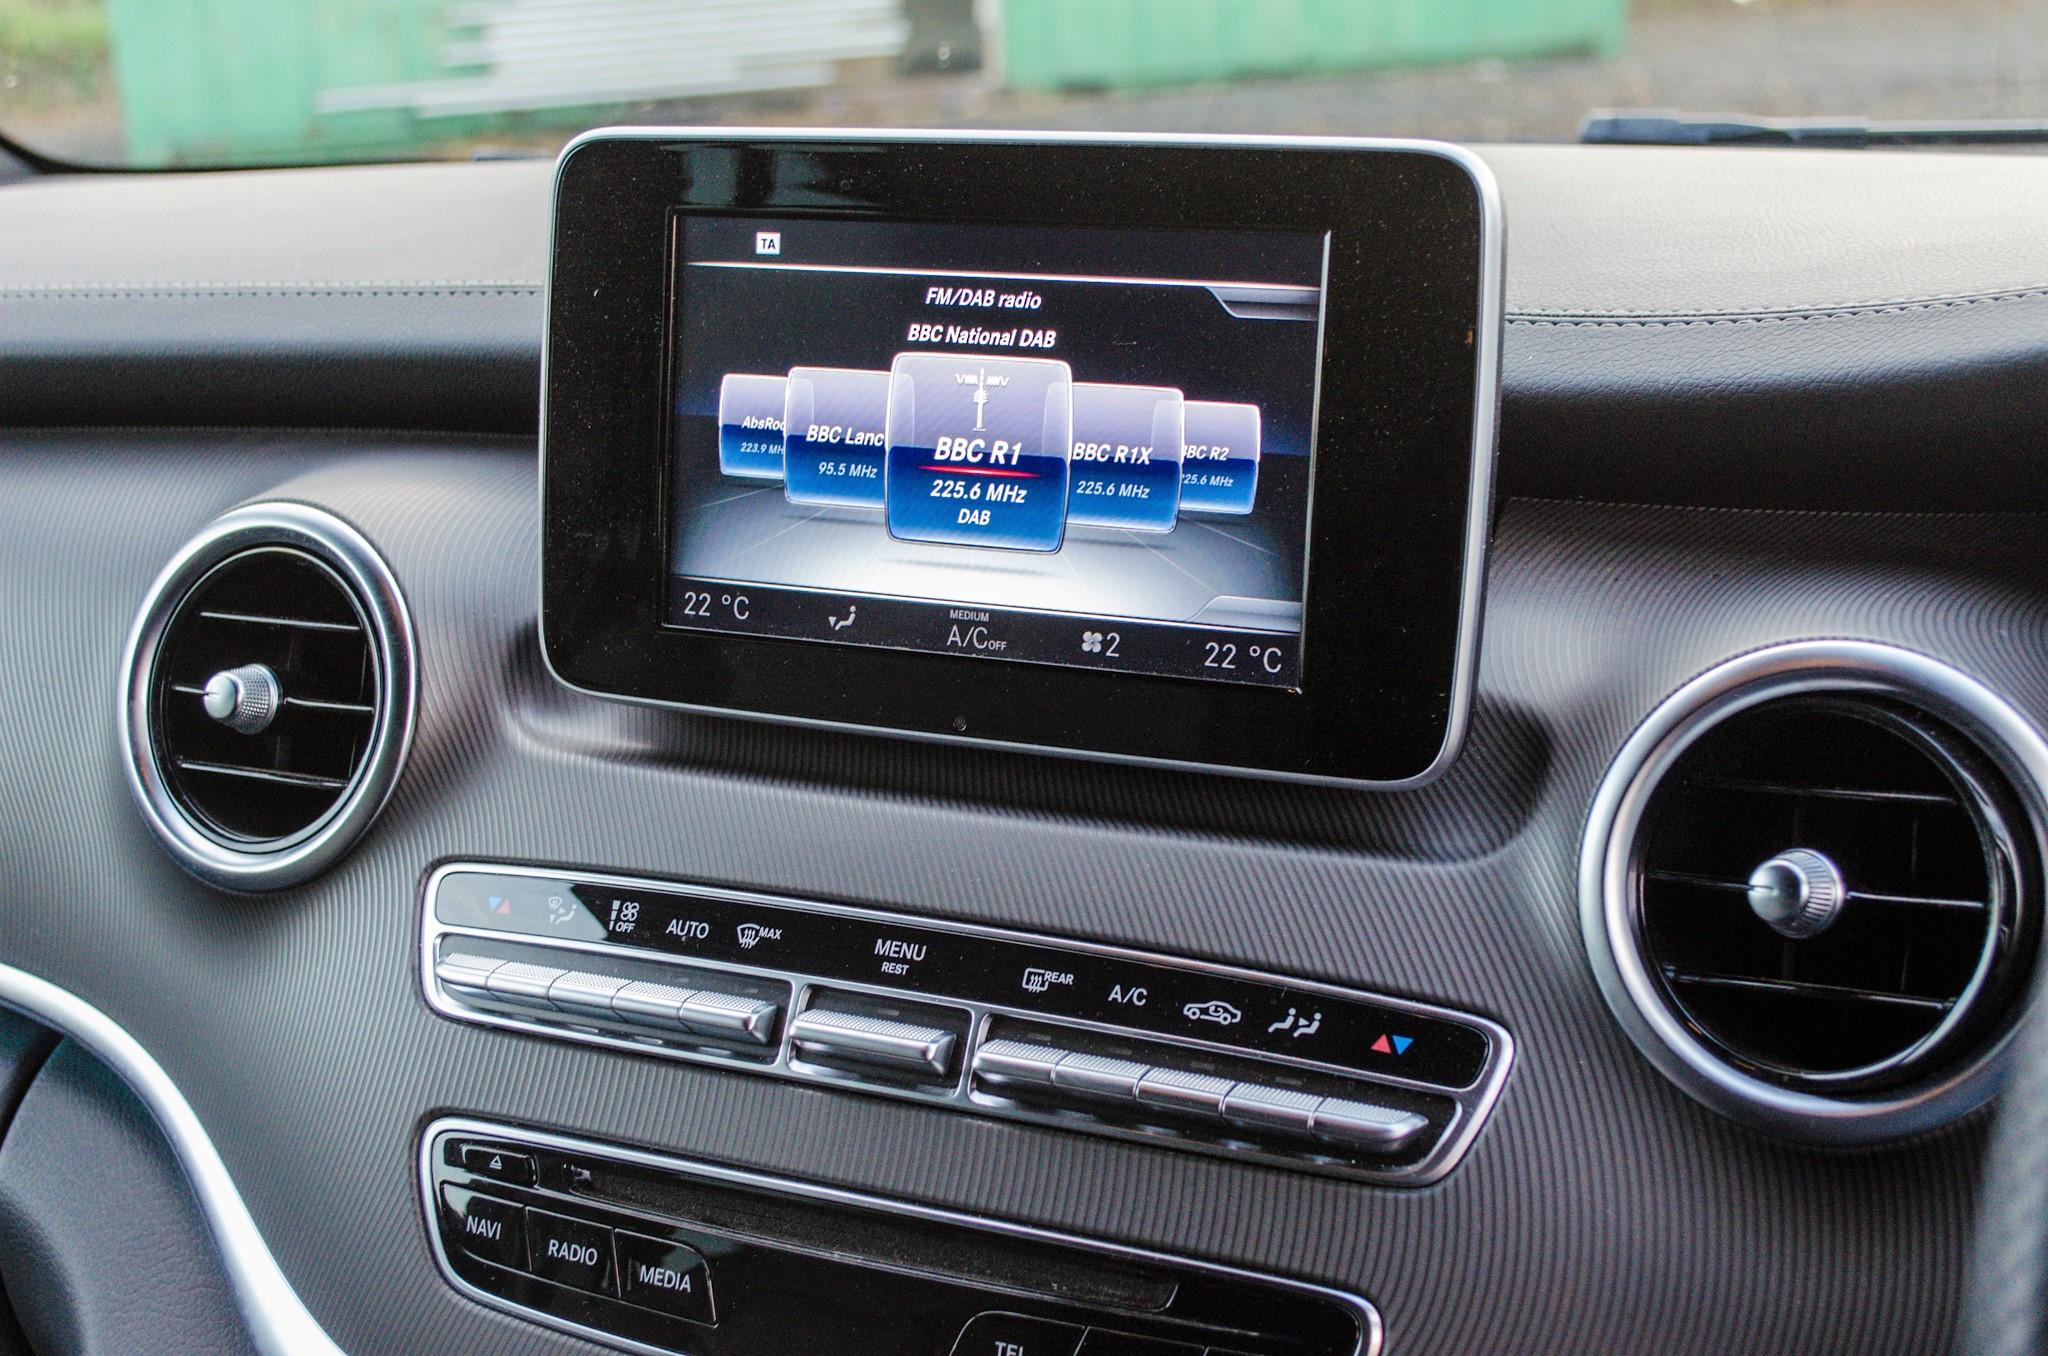 Mercedes Benz V250 Sport Bluetec XLWB auto diesel 8 seat MPV Reg No: FY68 JTO Date of First - Image 24 of 27